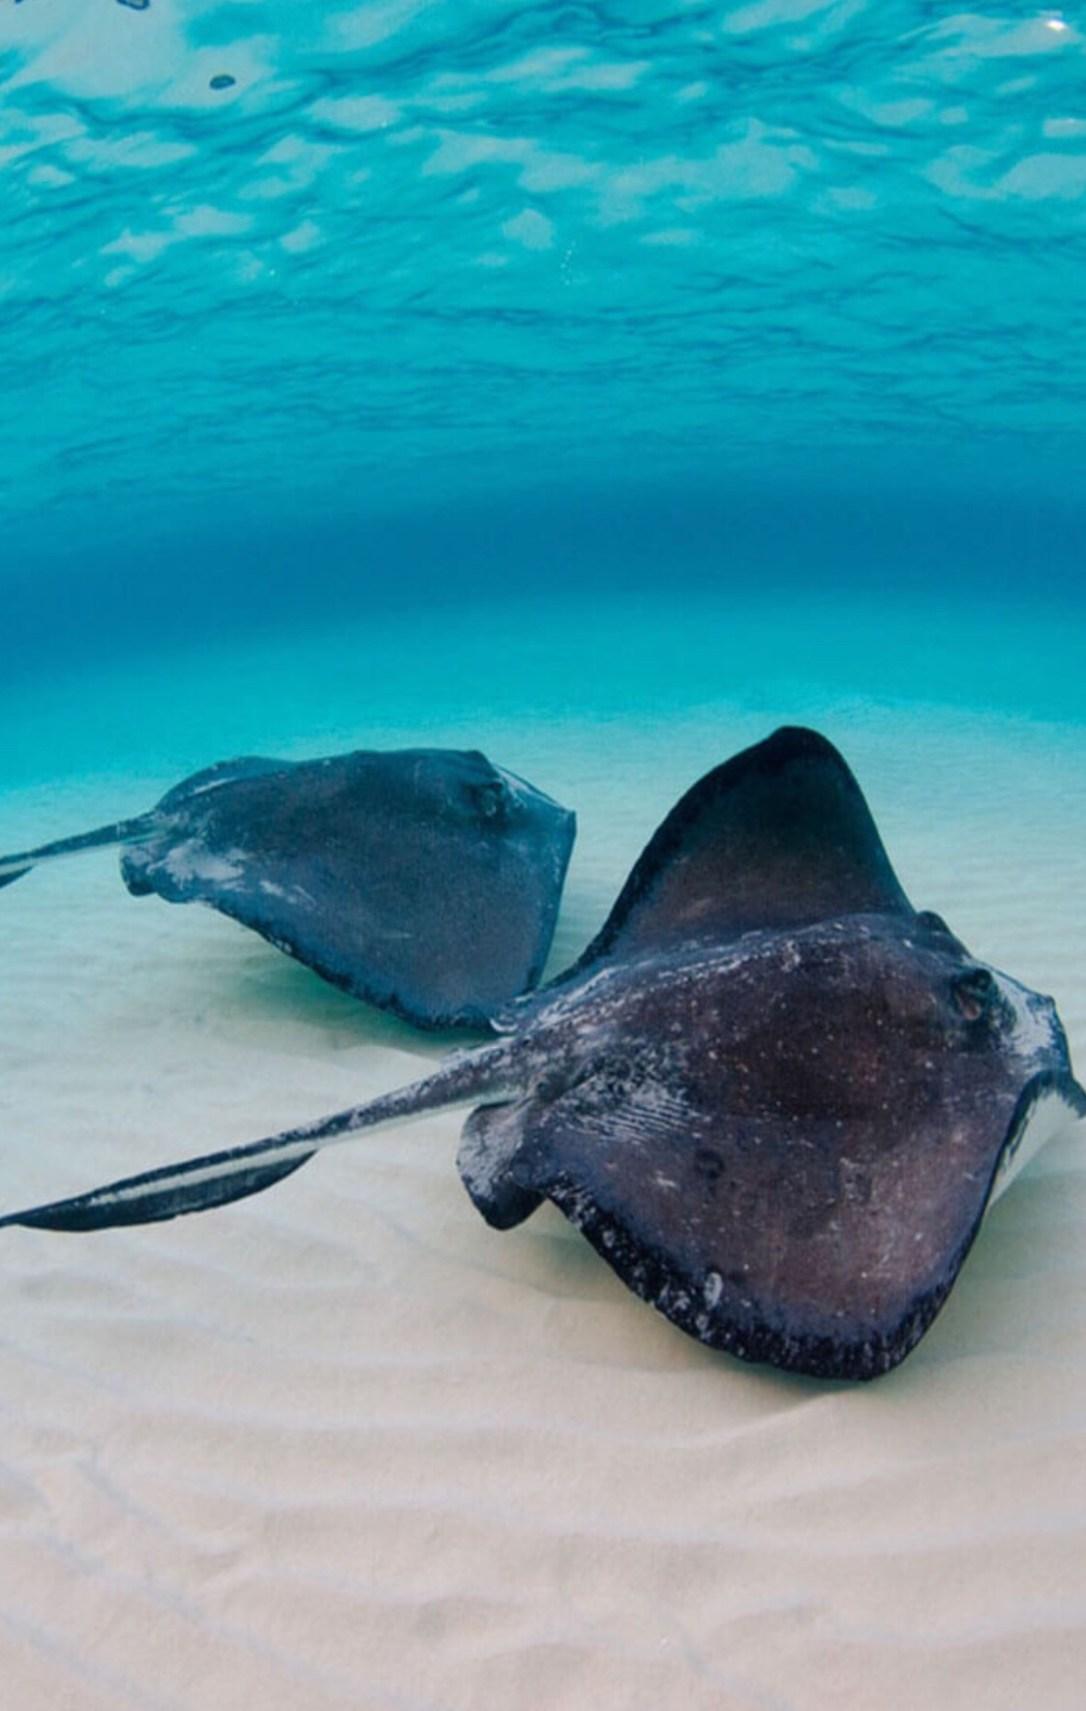 stingrays in the sea